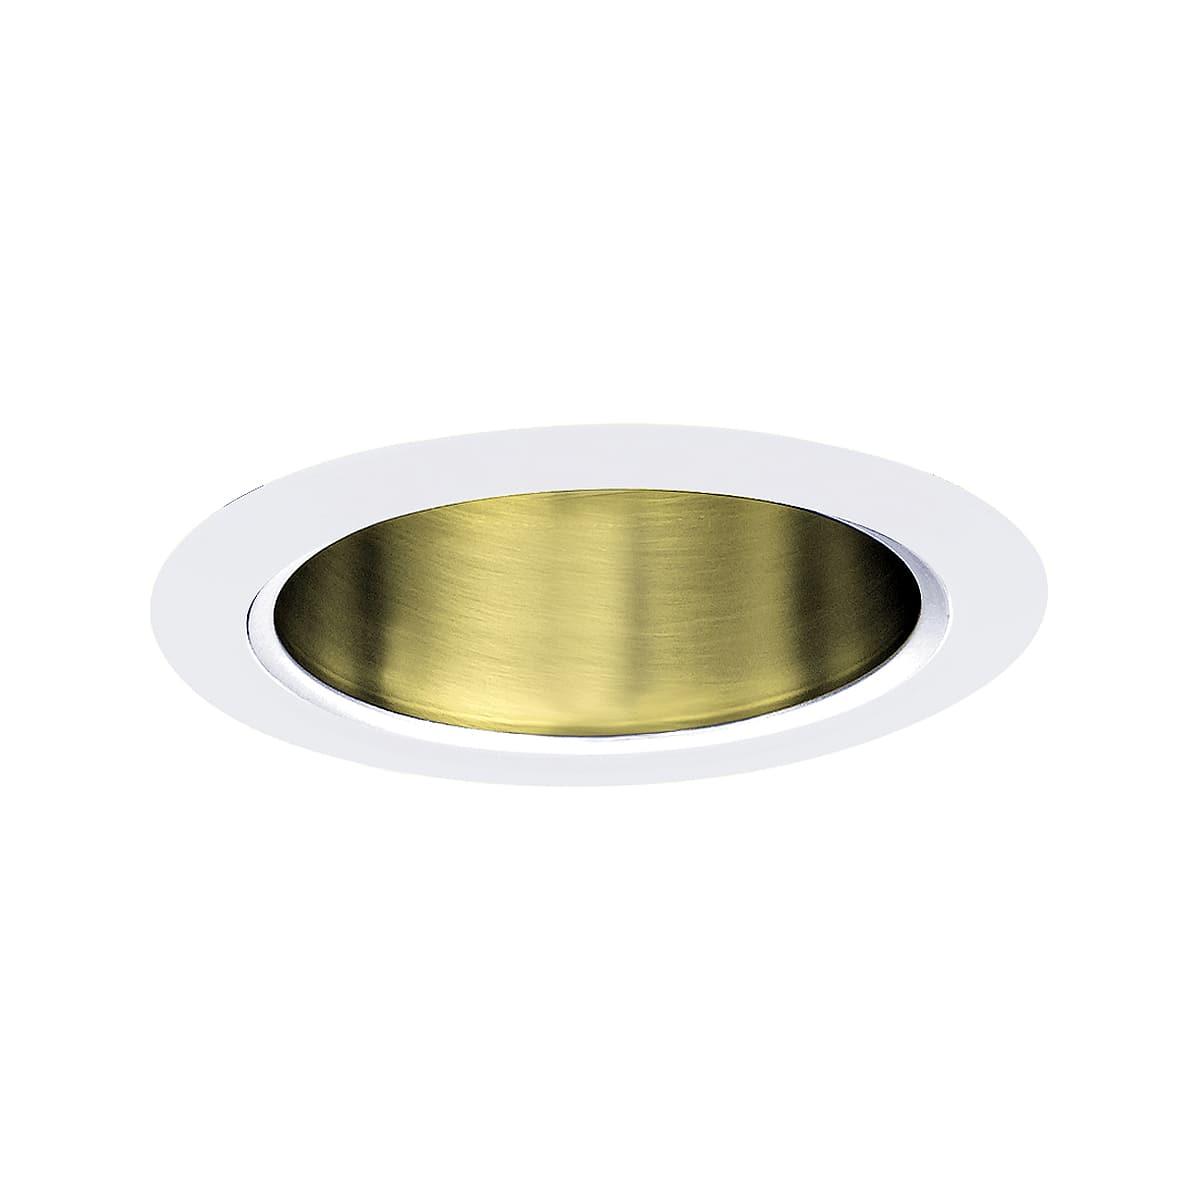 Jesco Lighting Tm5510pbwh Polished Brass White 5 Inch Recessed Reflector Trim Lightingshowplace Com